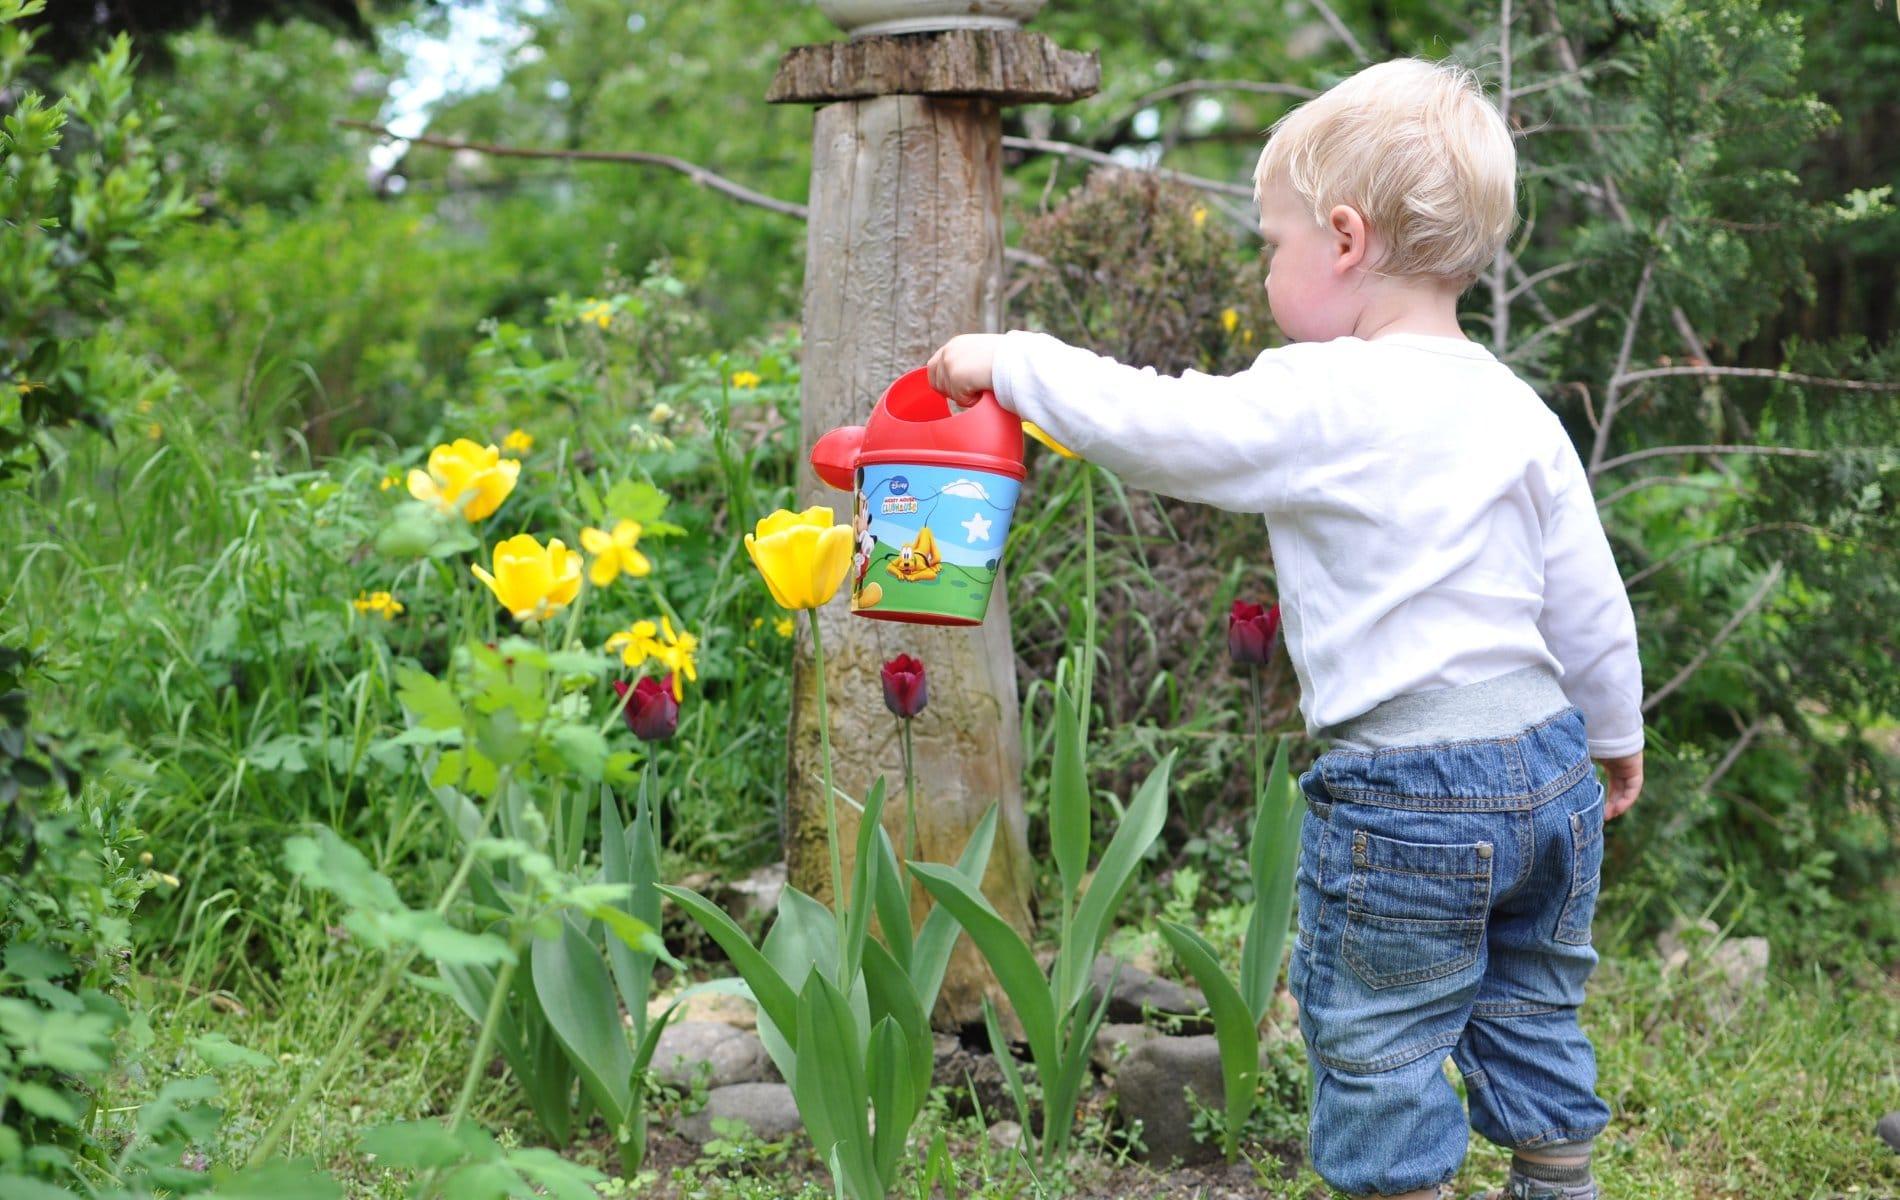 8 Best Gardening Gloves for Toddlers